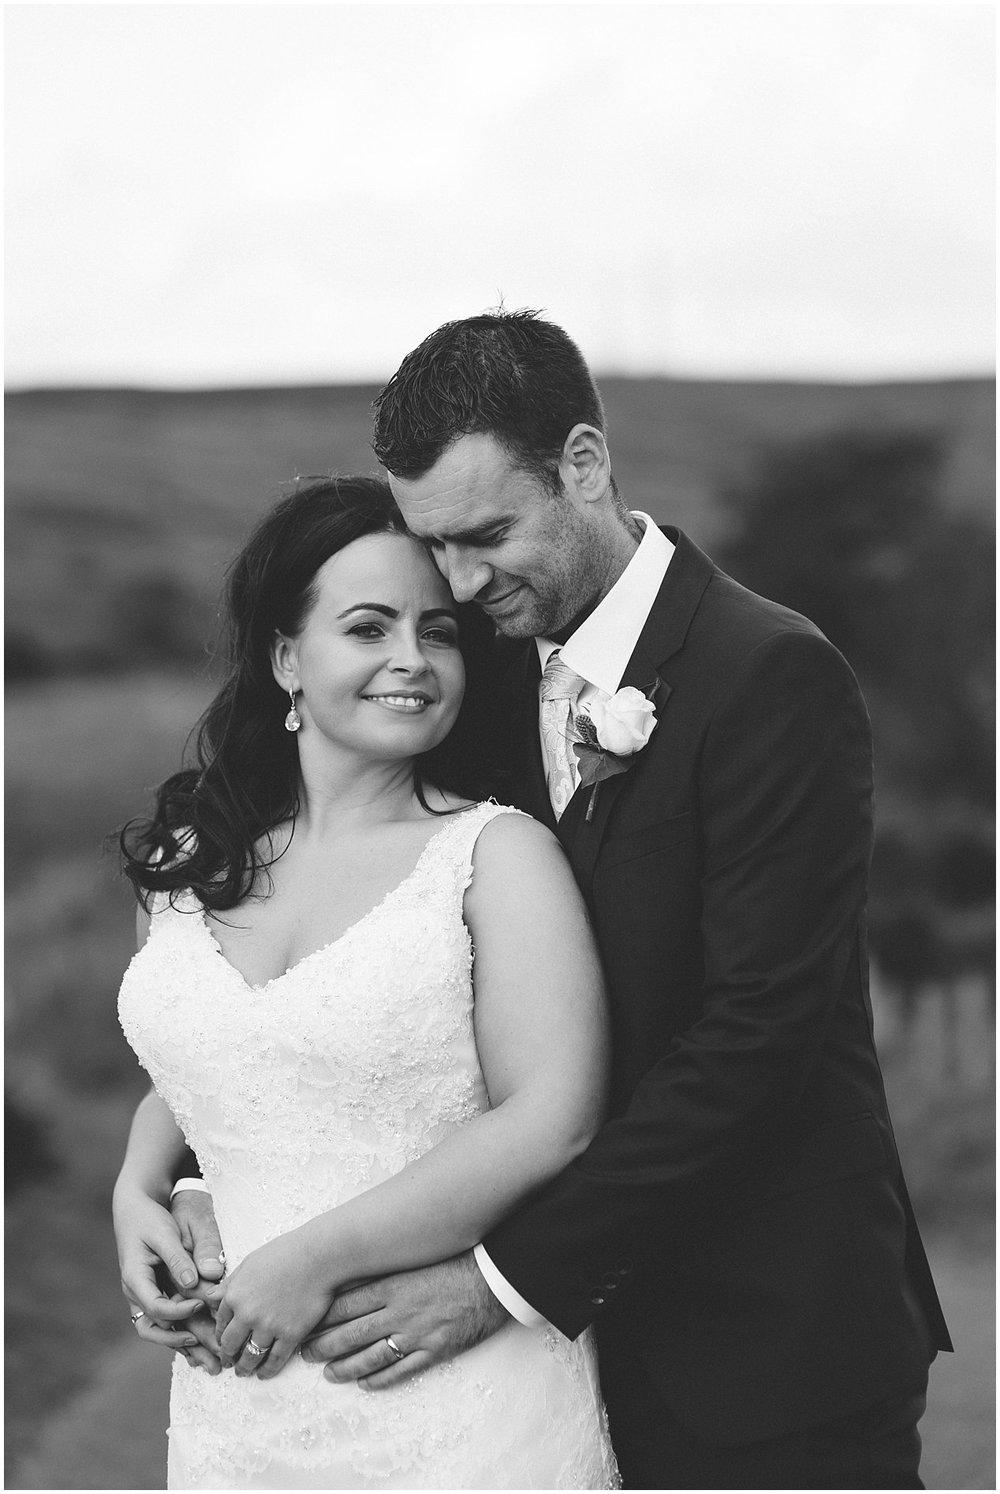 Shauneen_PJ_Hillgrove_Hotel_Monaghan_Wedding_jude_browne_photography_0062.jpg